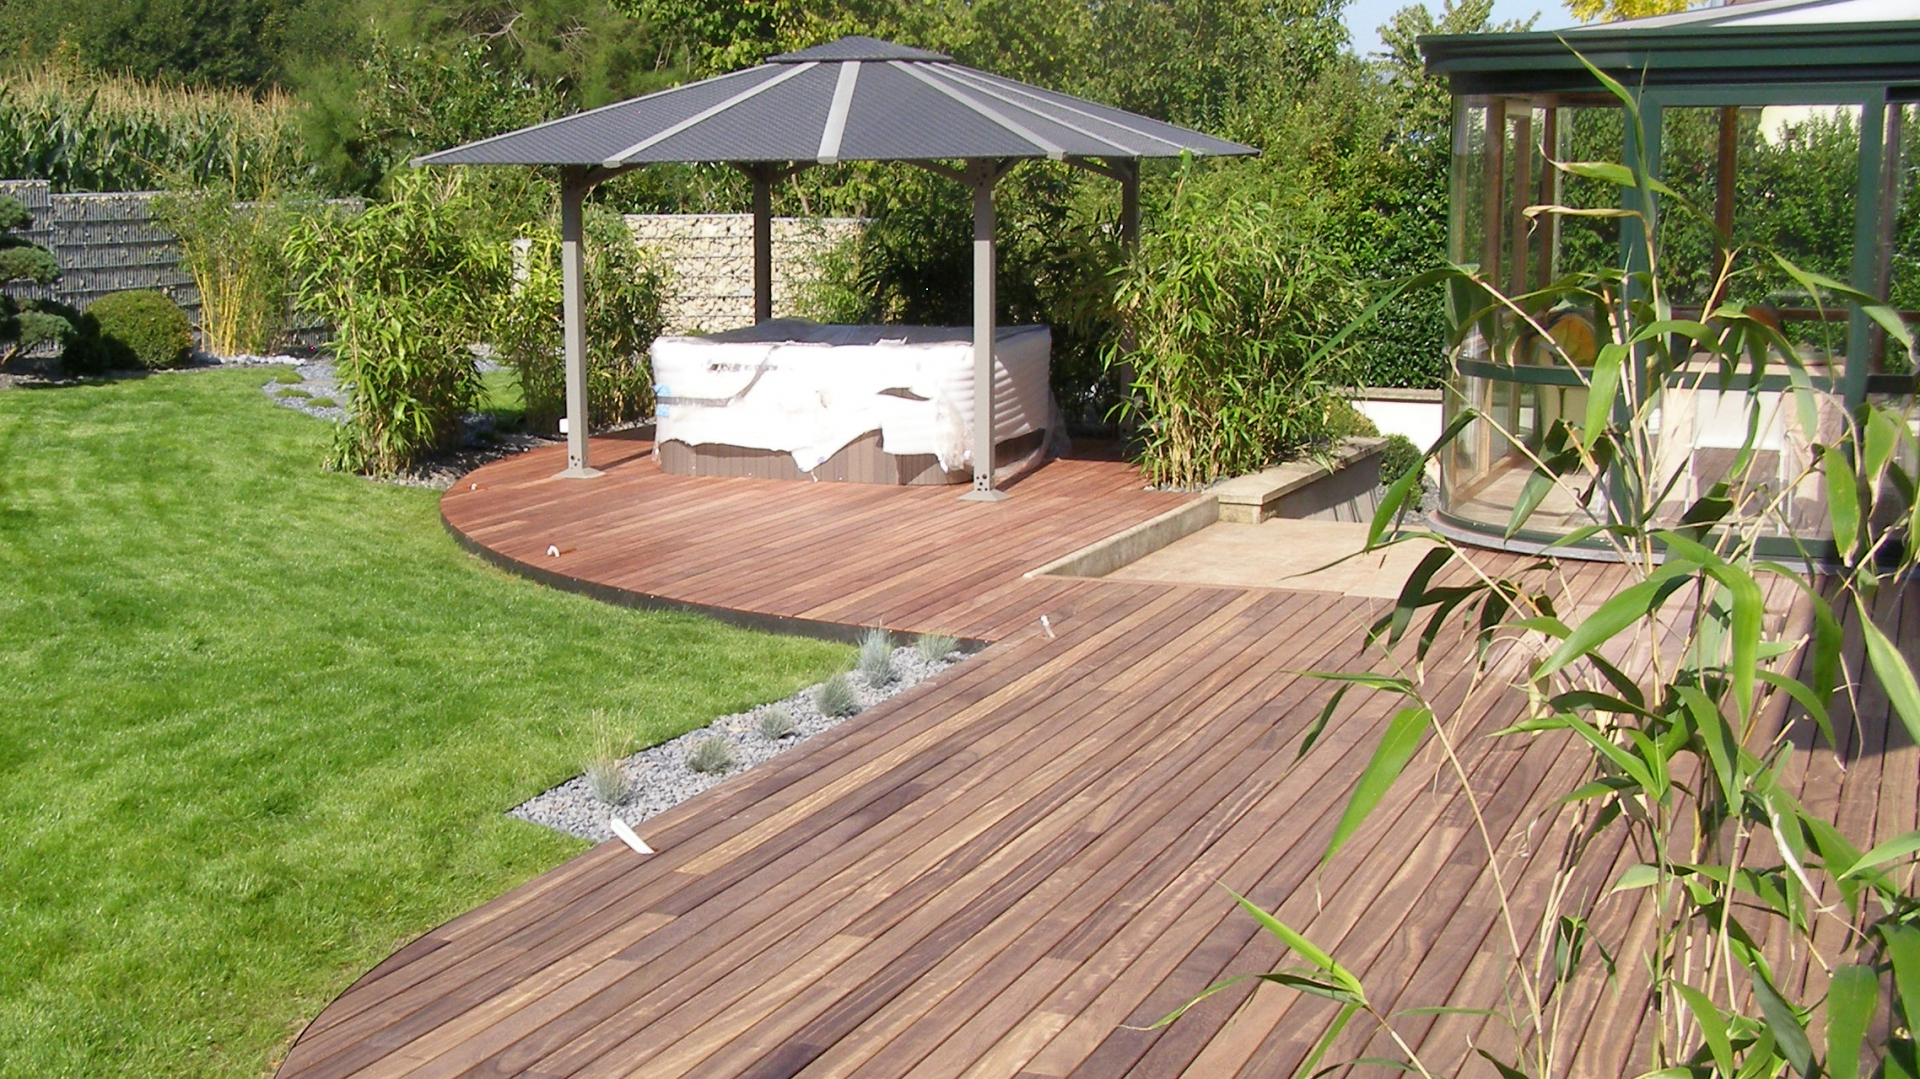 Dřevěné terasy, terasová prkna | Fasády&Terasy - Dřevěné terasy Softline®